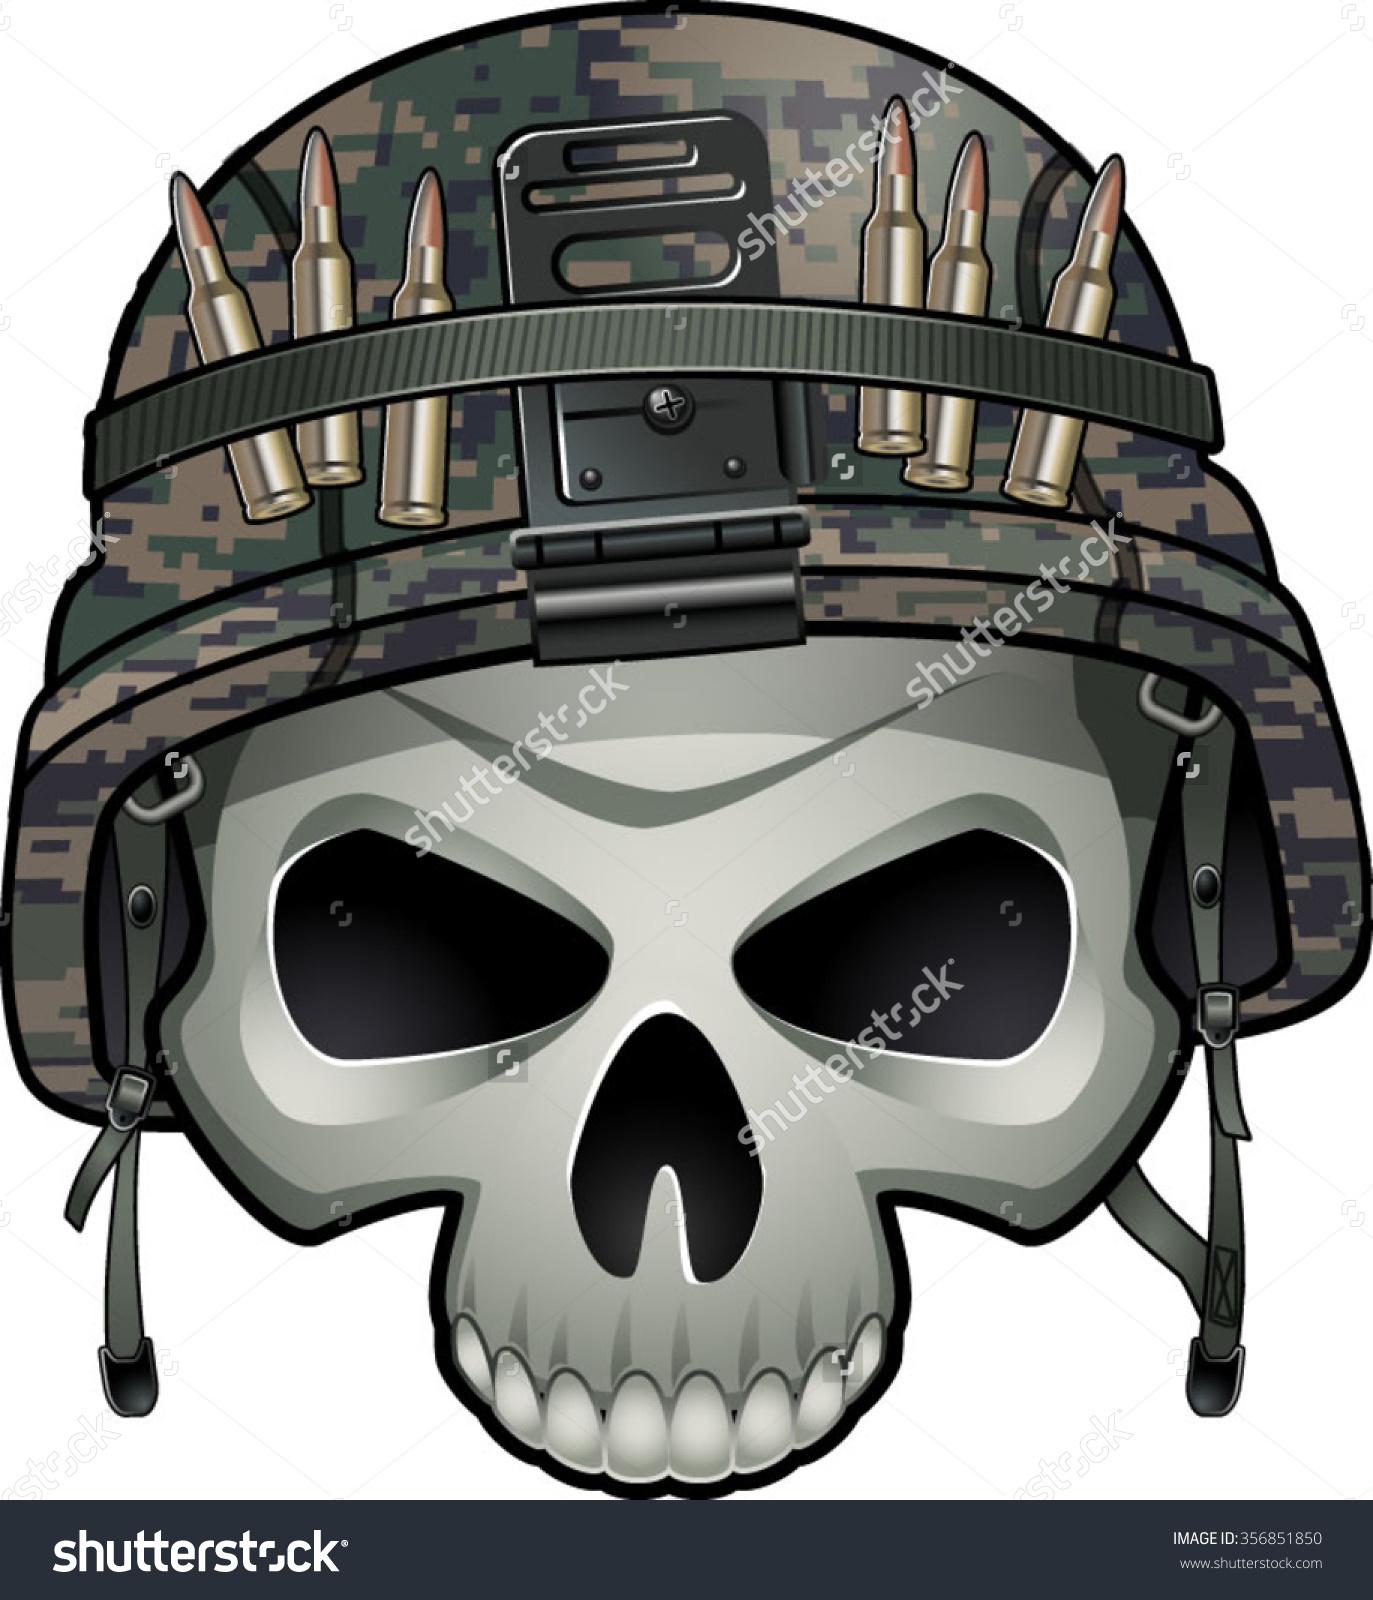 Military Skull Wearing Kevlar Helmet Stock Vector 356851850.